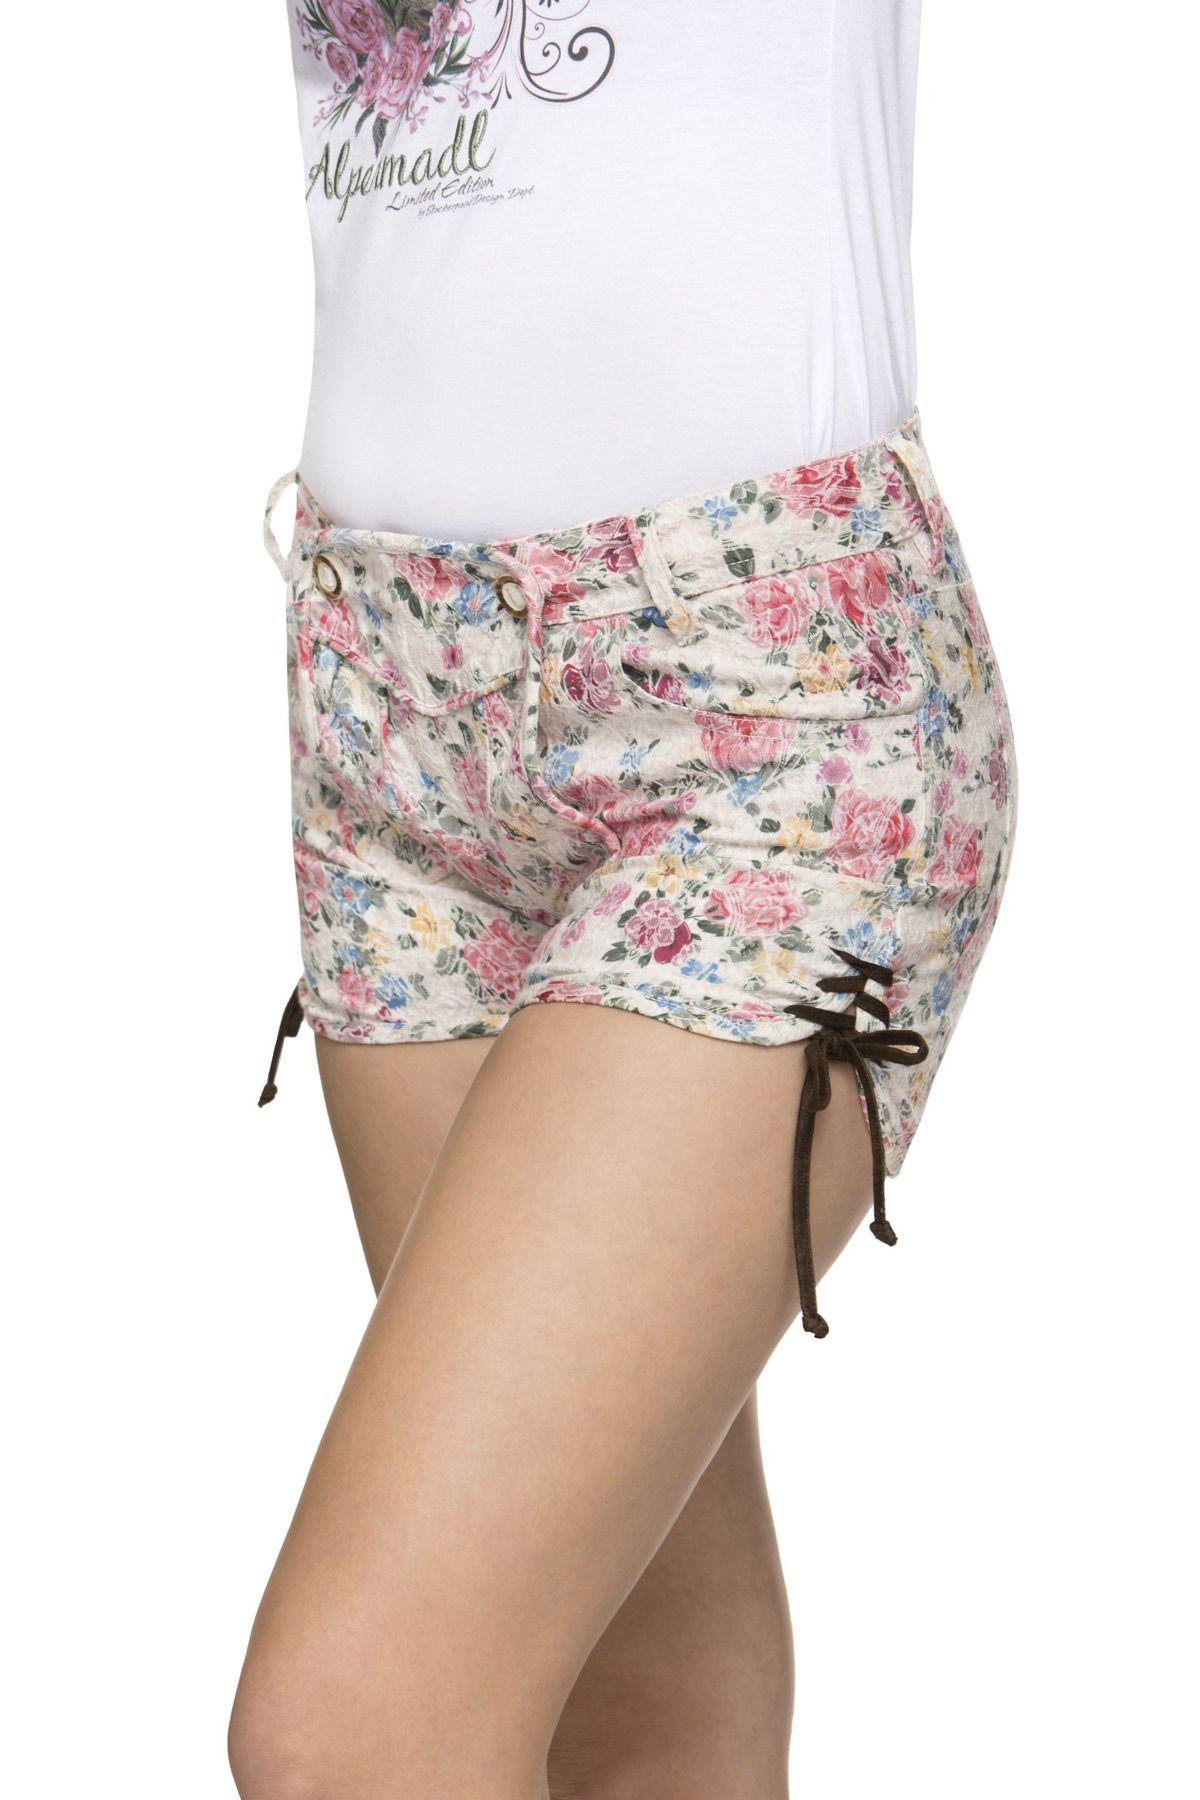 Stockerpoint - Damen Trachten Short, Patty – Bild 8